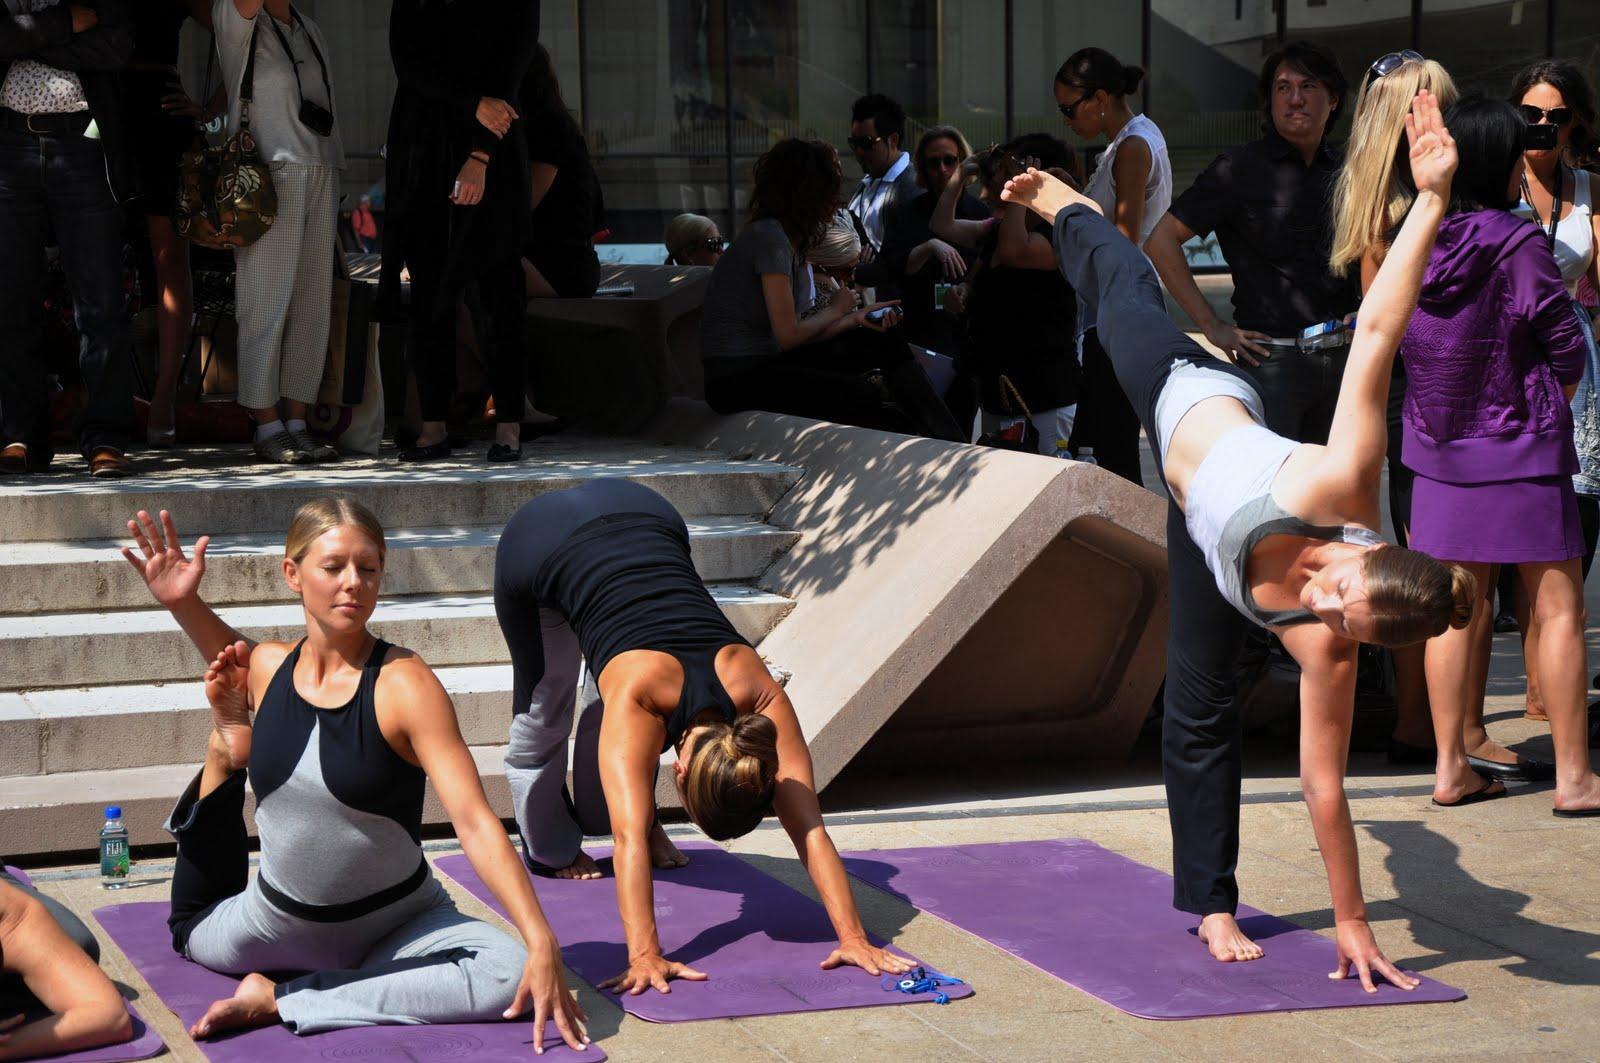 New York Yoga: New York Yoga at Fashion Week!